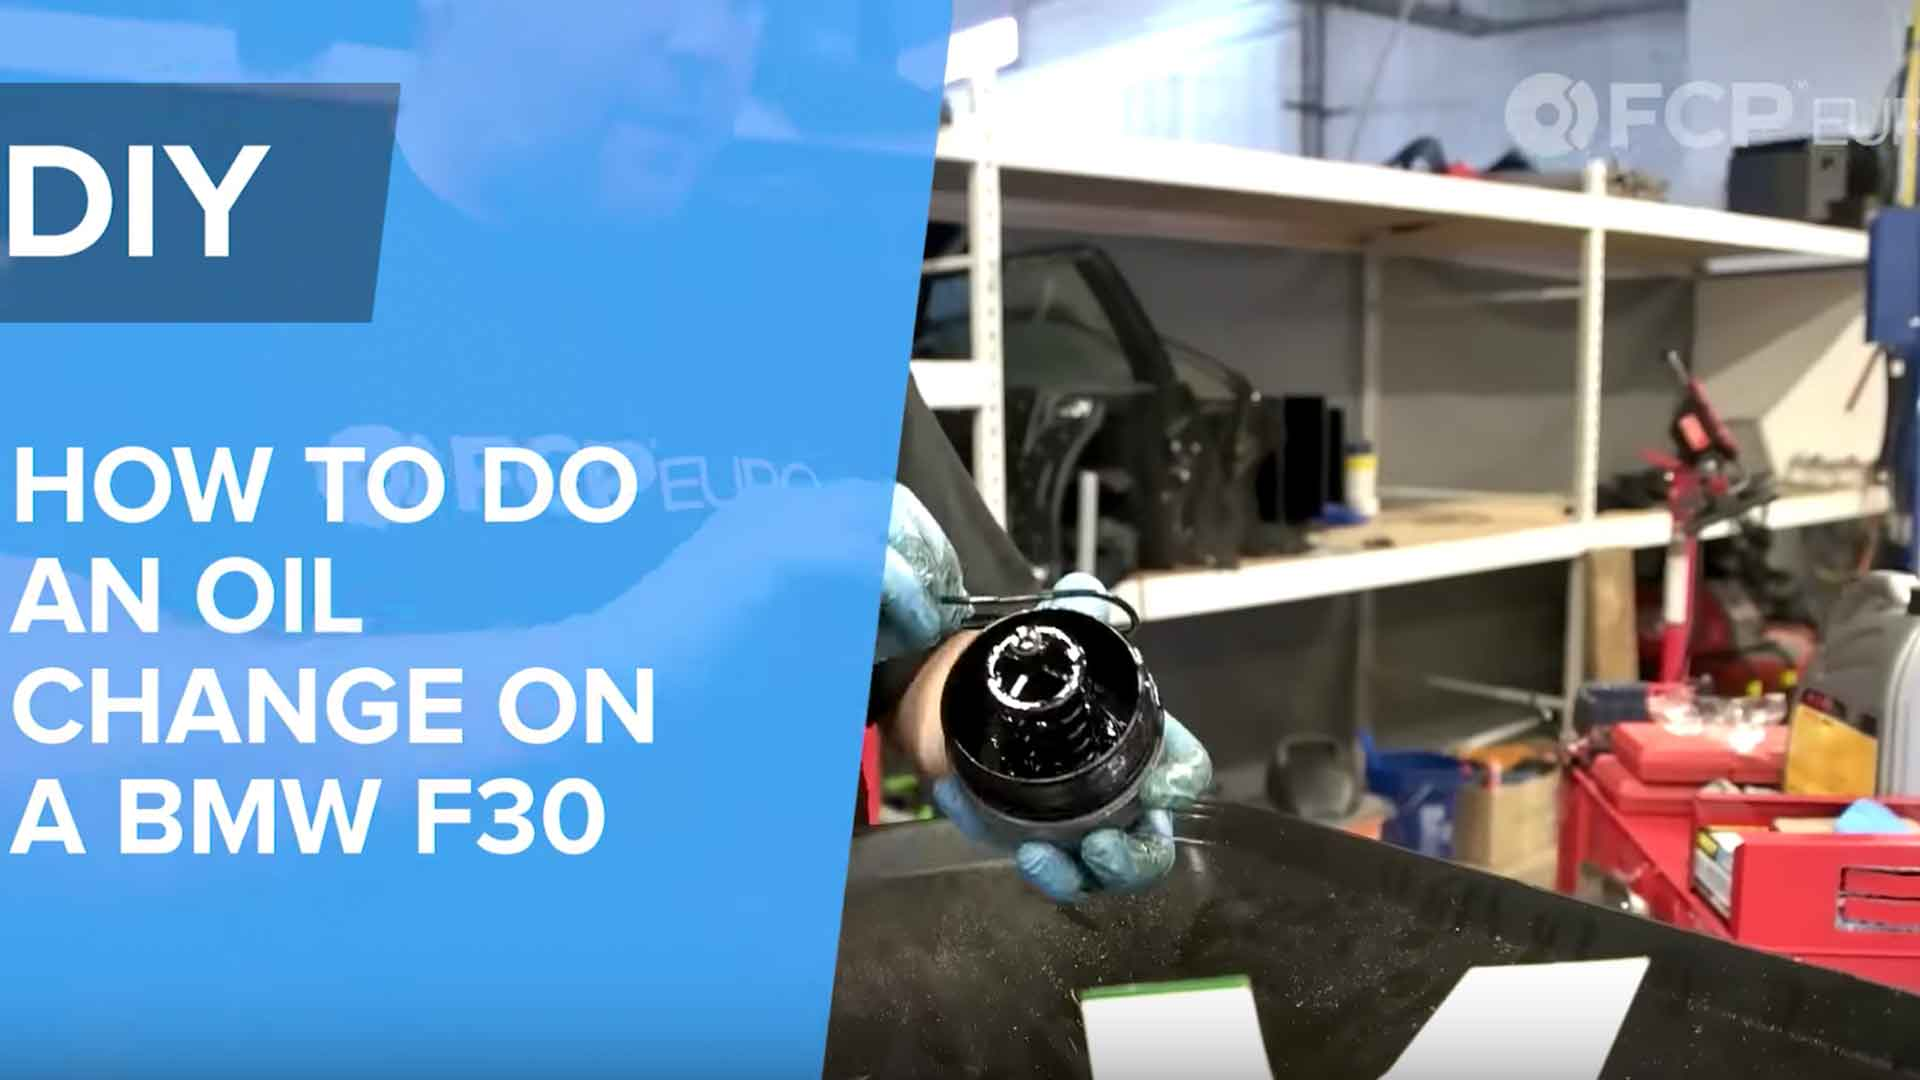 BMW F30 Oil Change